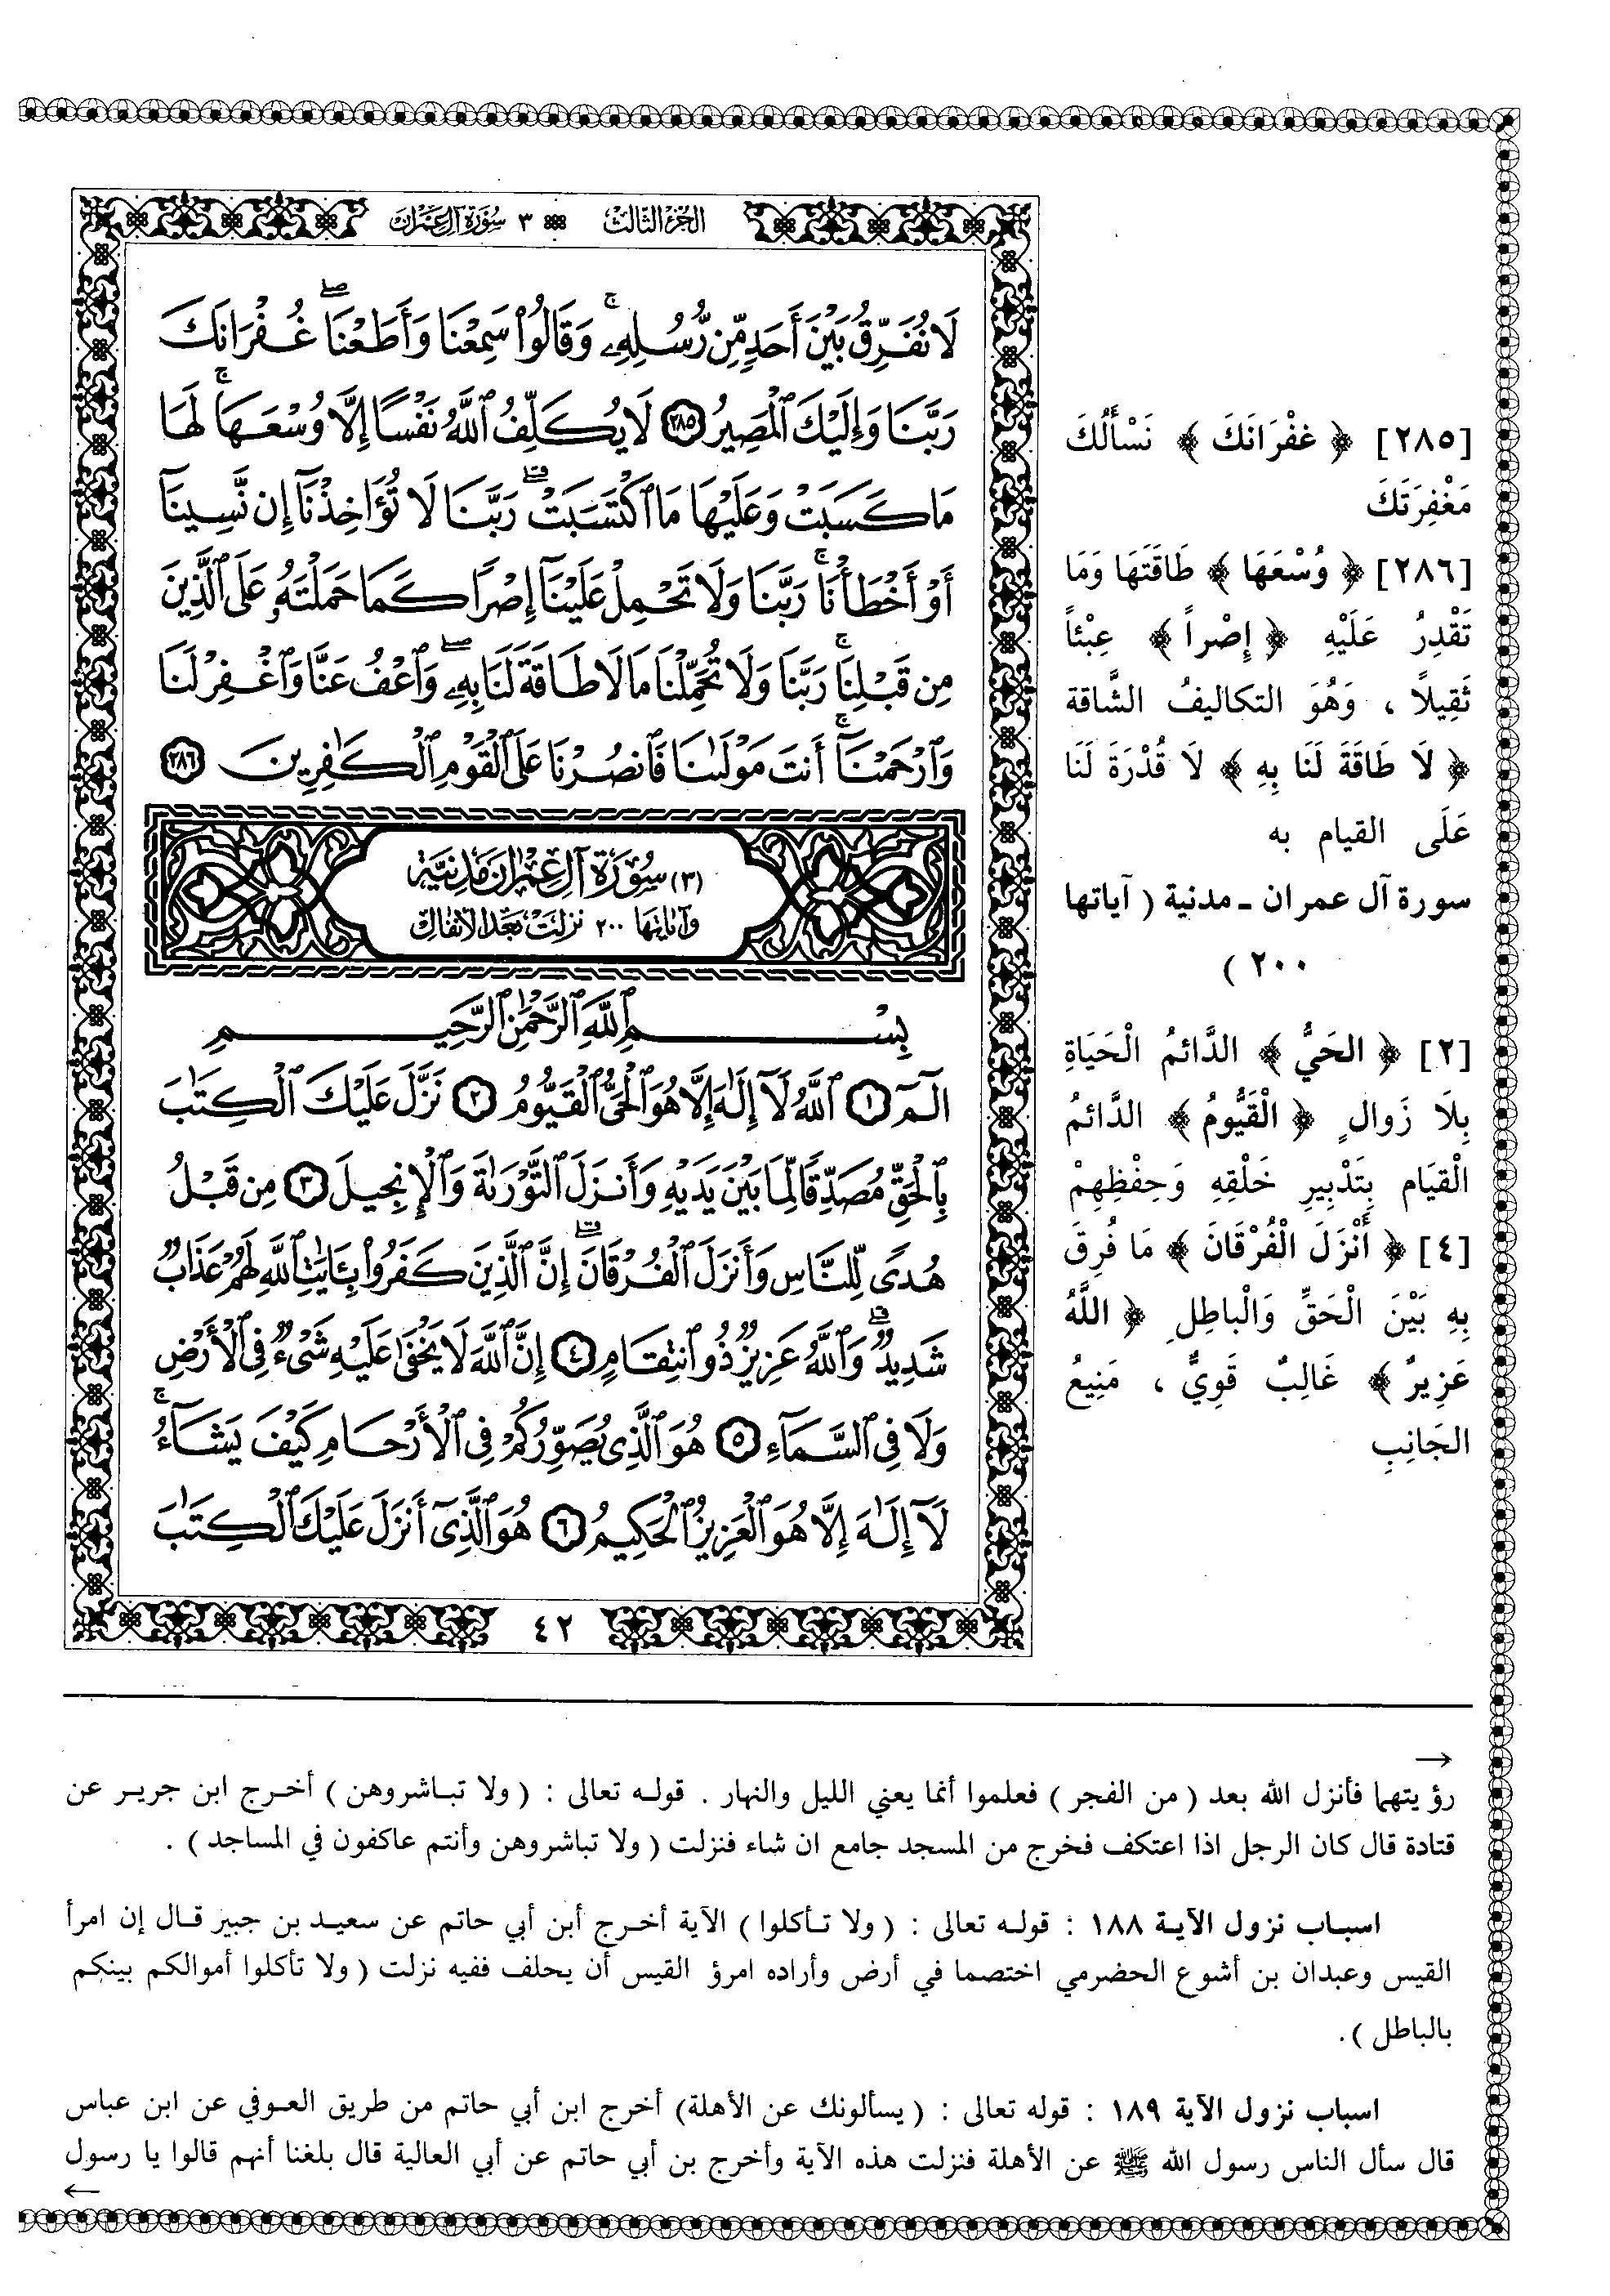 Pin By القران الكريم The Holy Quran On القرآن الكريم بالرسم العثماني وبهامشه كلمات القرآن تفسيروبيان Sheet Music